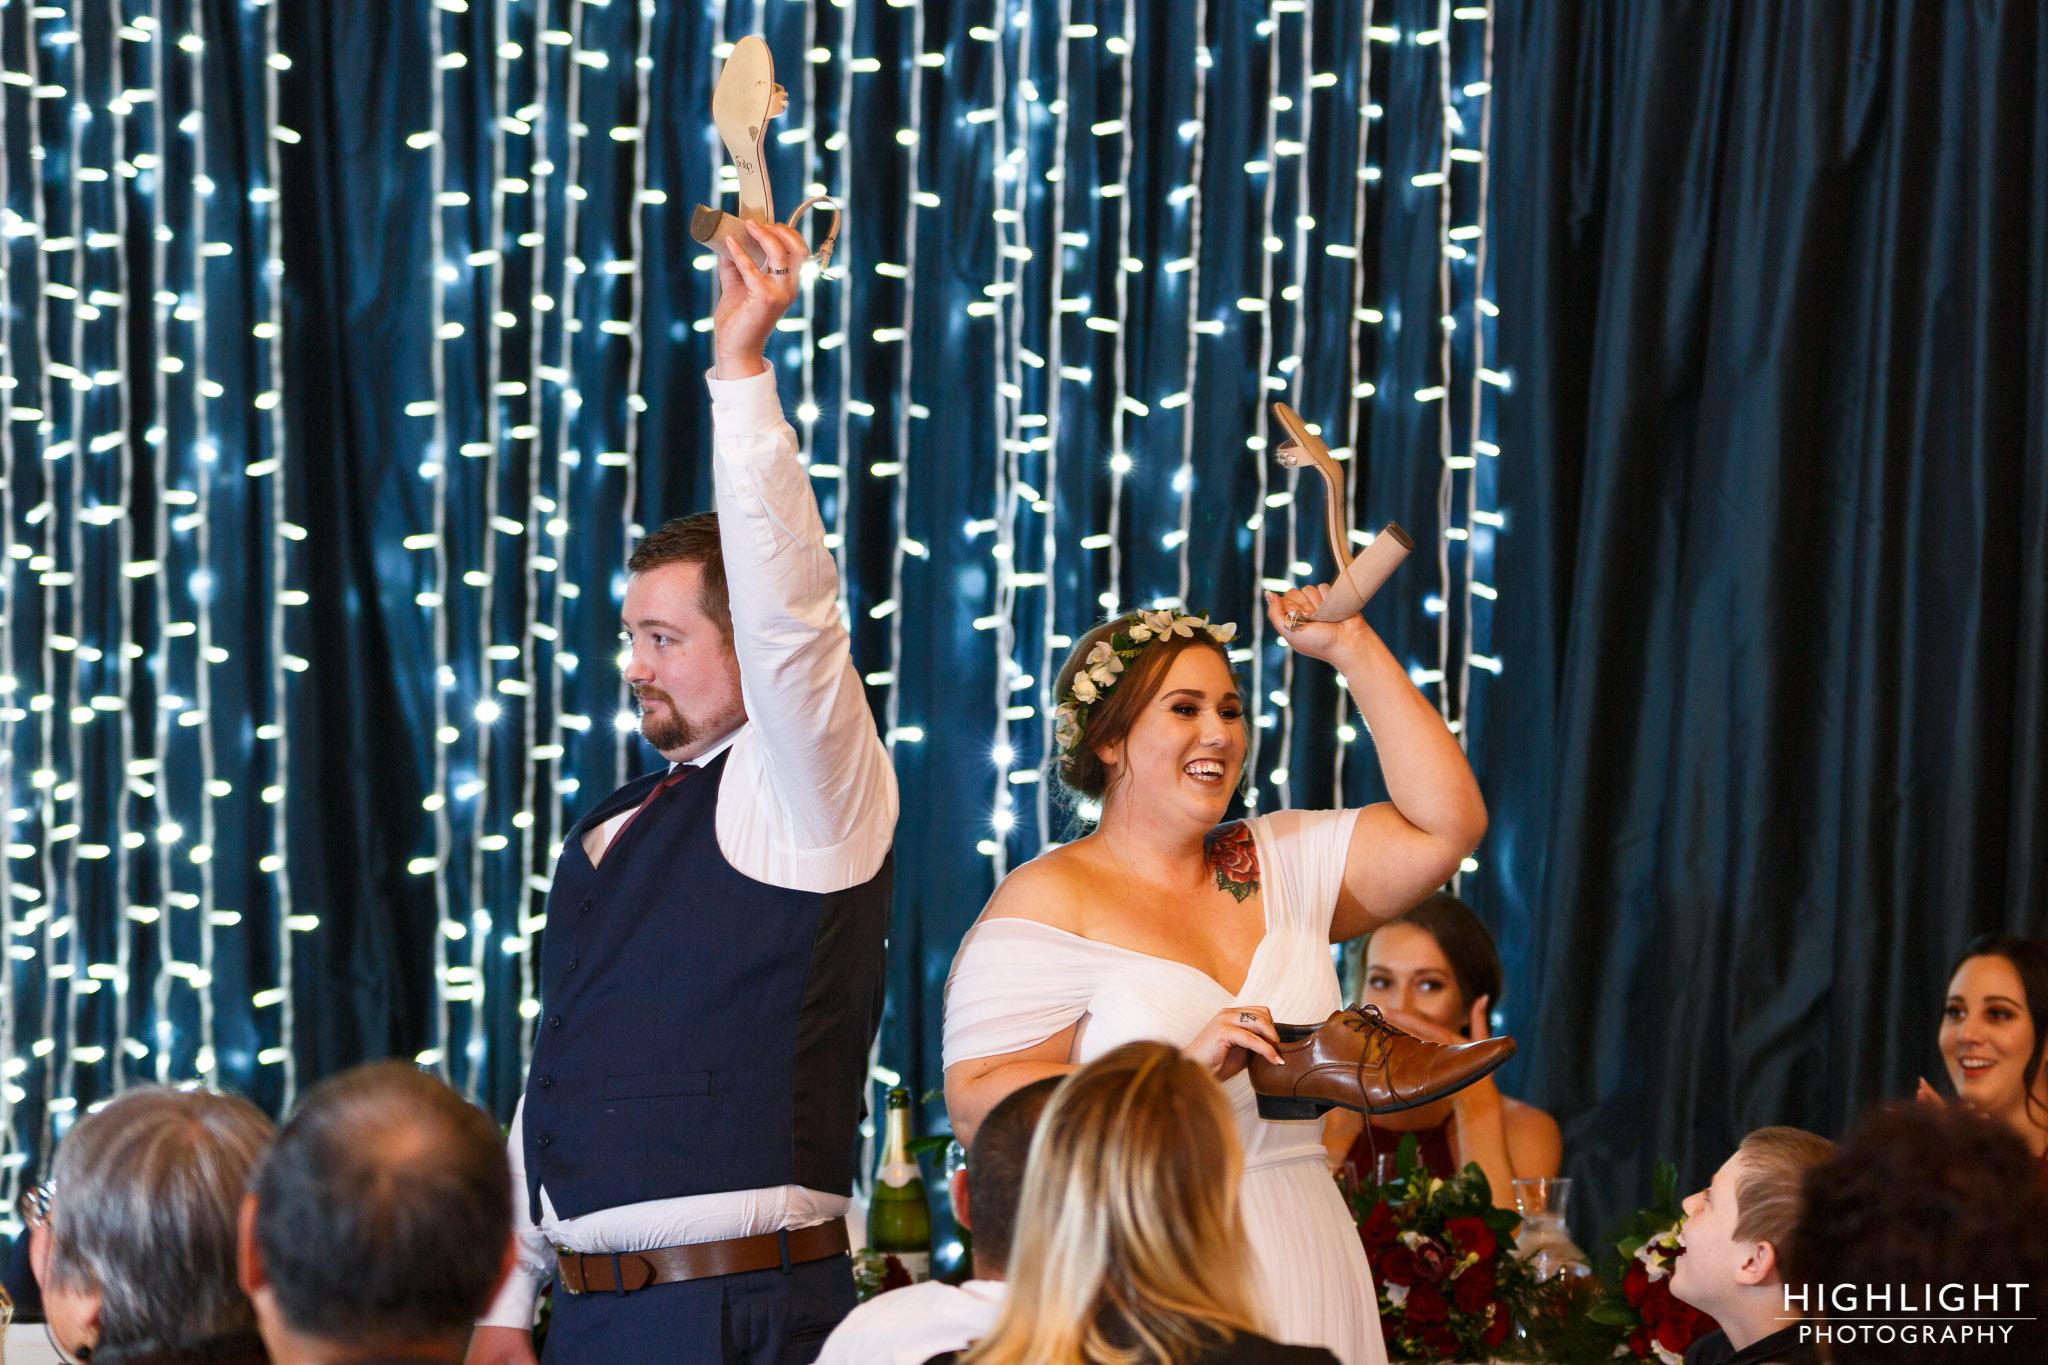 Highlight-wedding-photography-new-zealand-palmerston-north-112.jpg